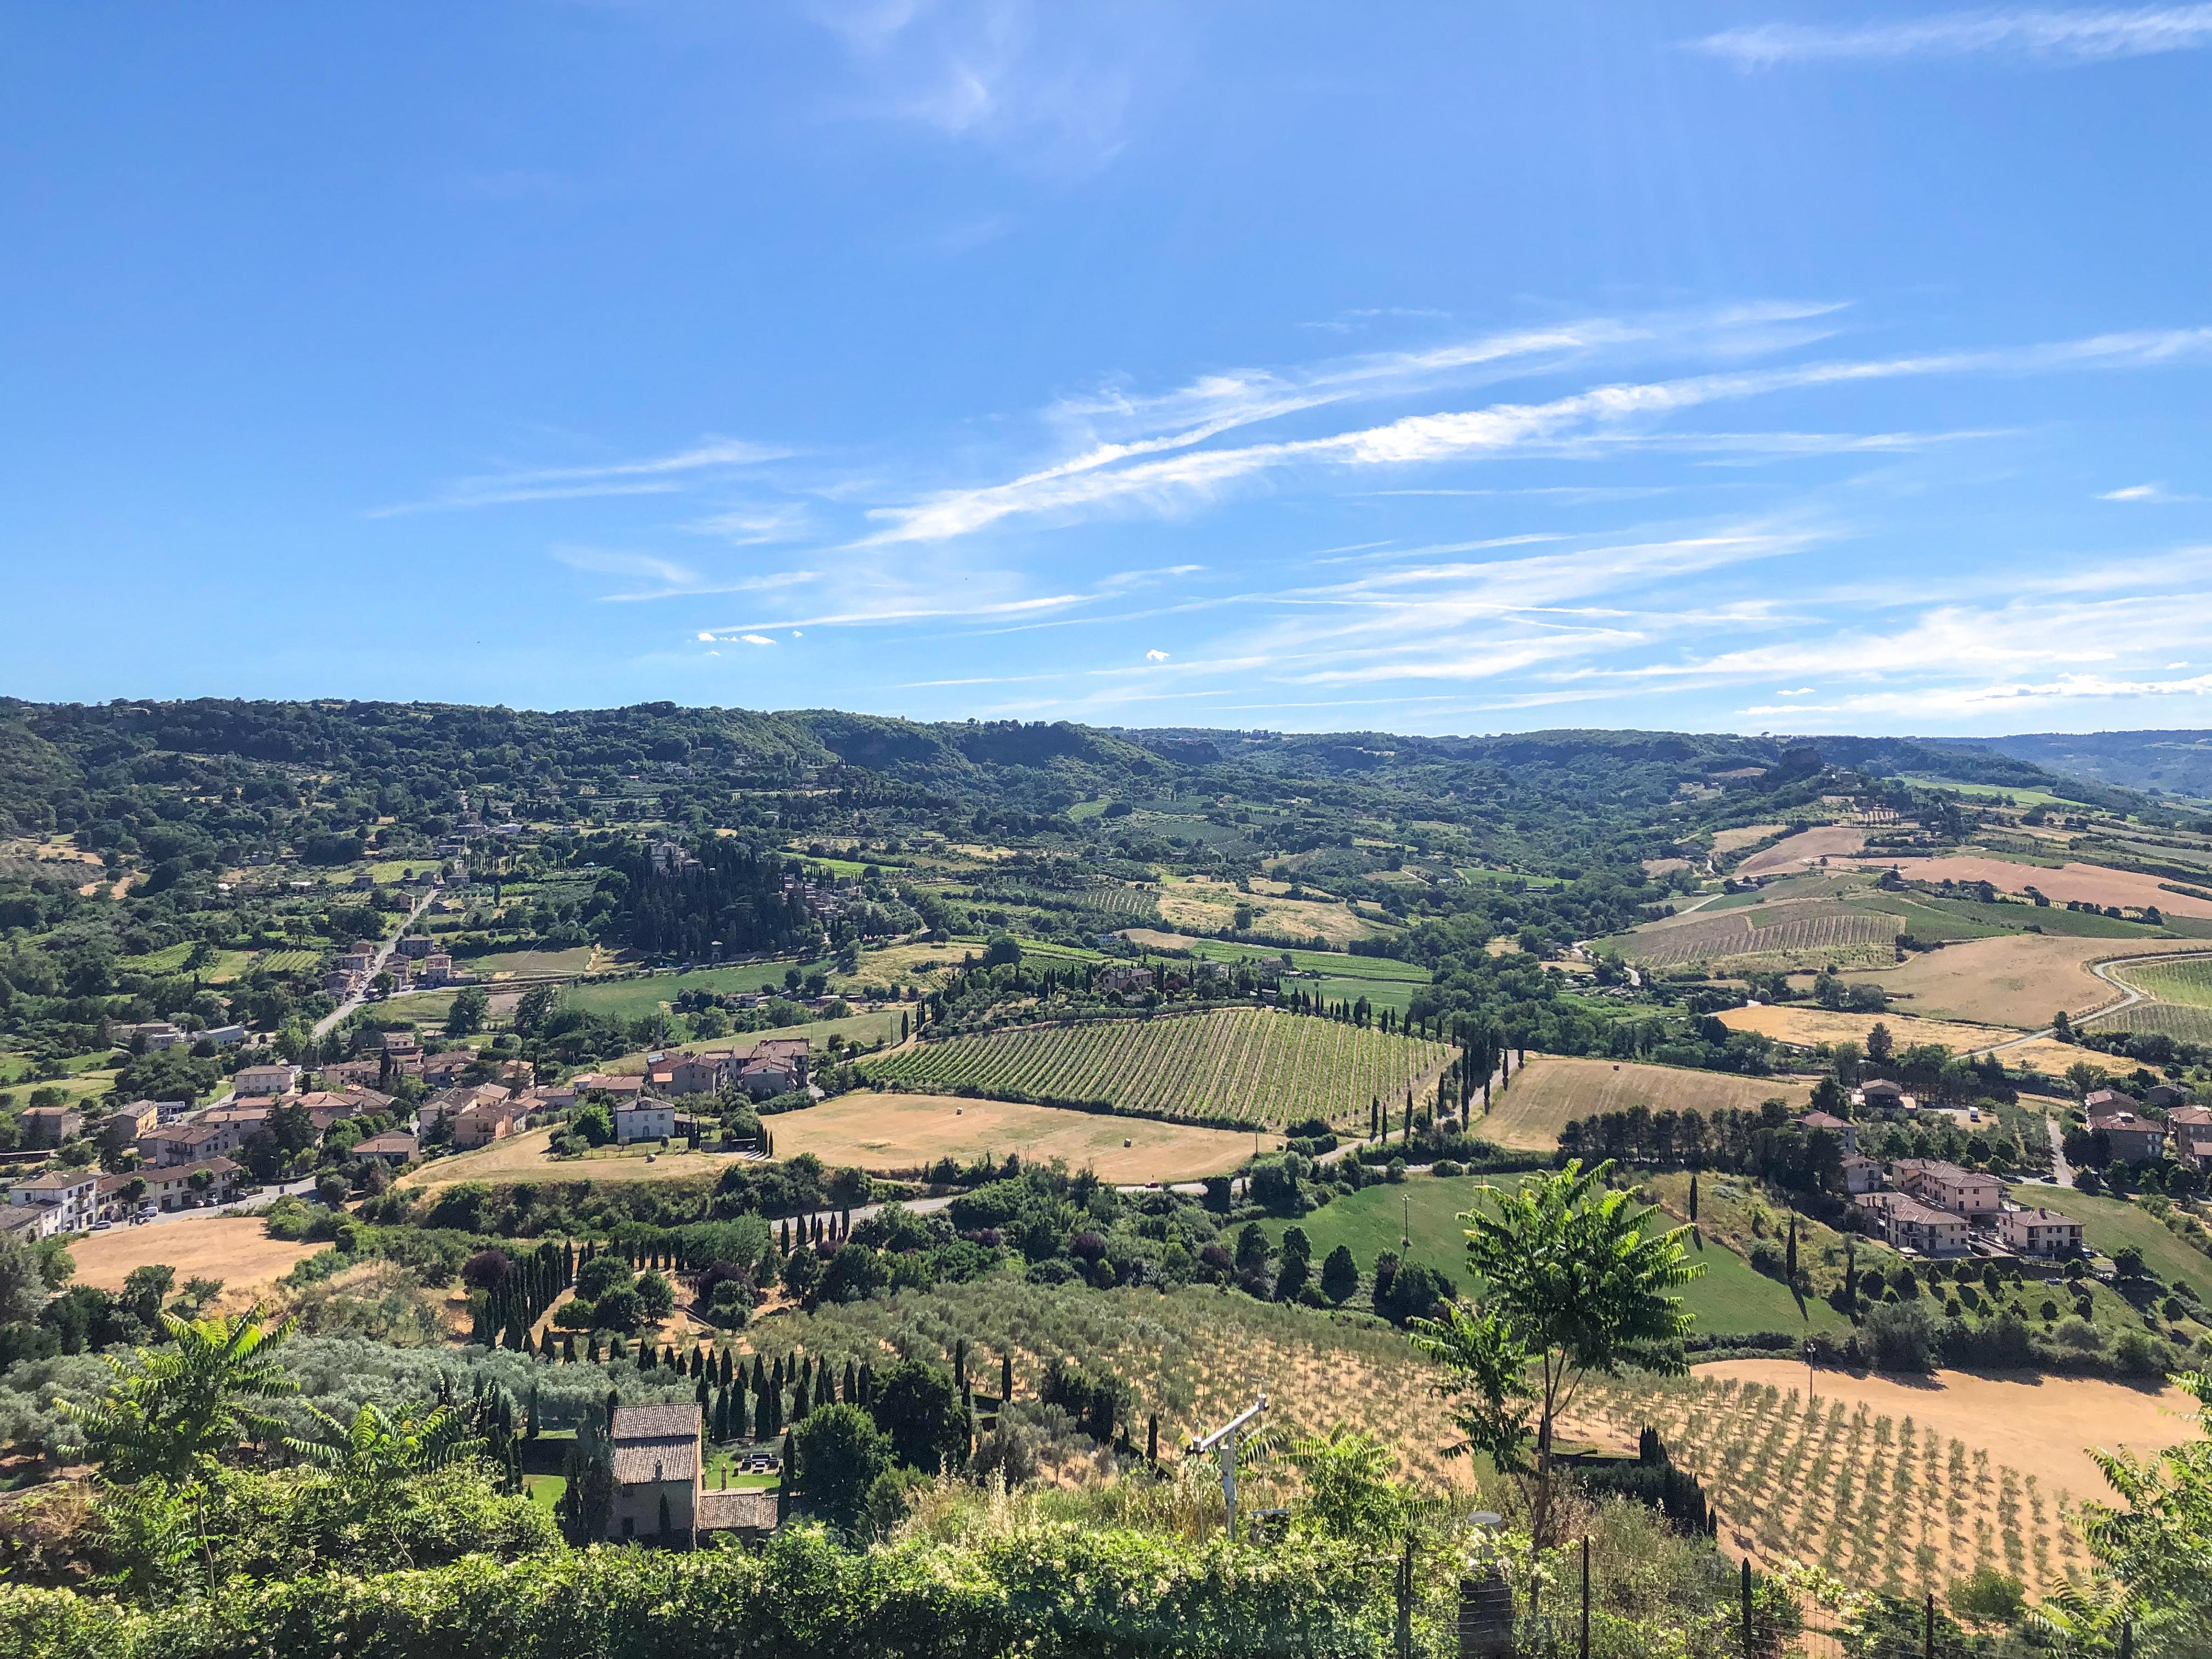 Italia - Italy - Casale Management - Travel - Orvieto - Colli umbri - Vista a Nord